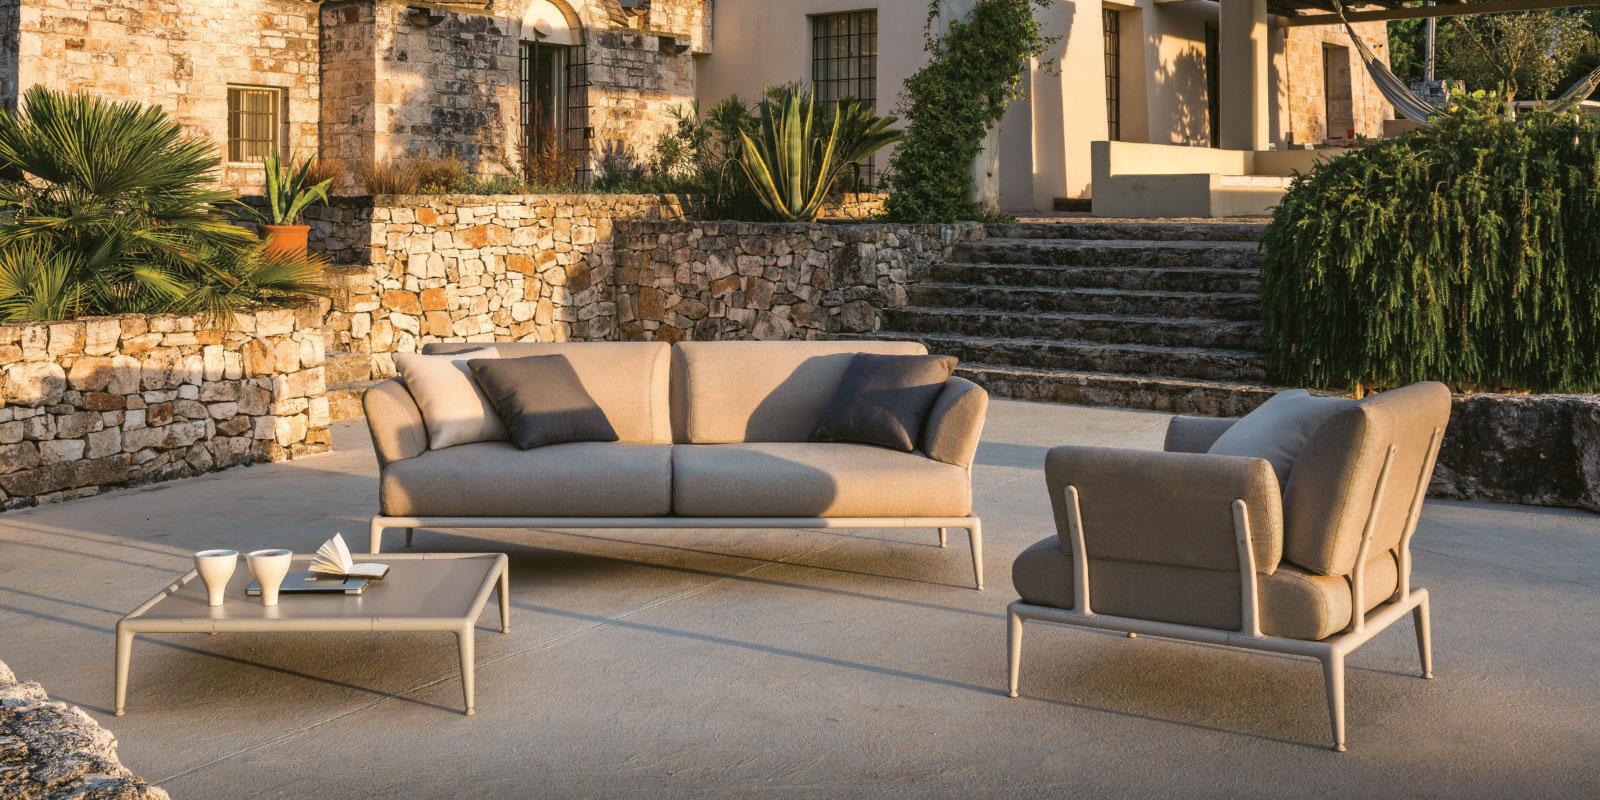 salon de jardin joint buxus mobilier outdoor bordeaux gironde. Black Bedroom Furniture Sets. Home Design Ideas